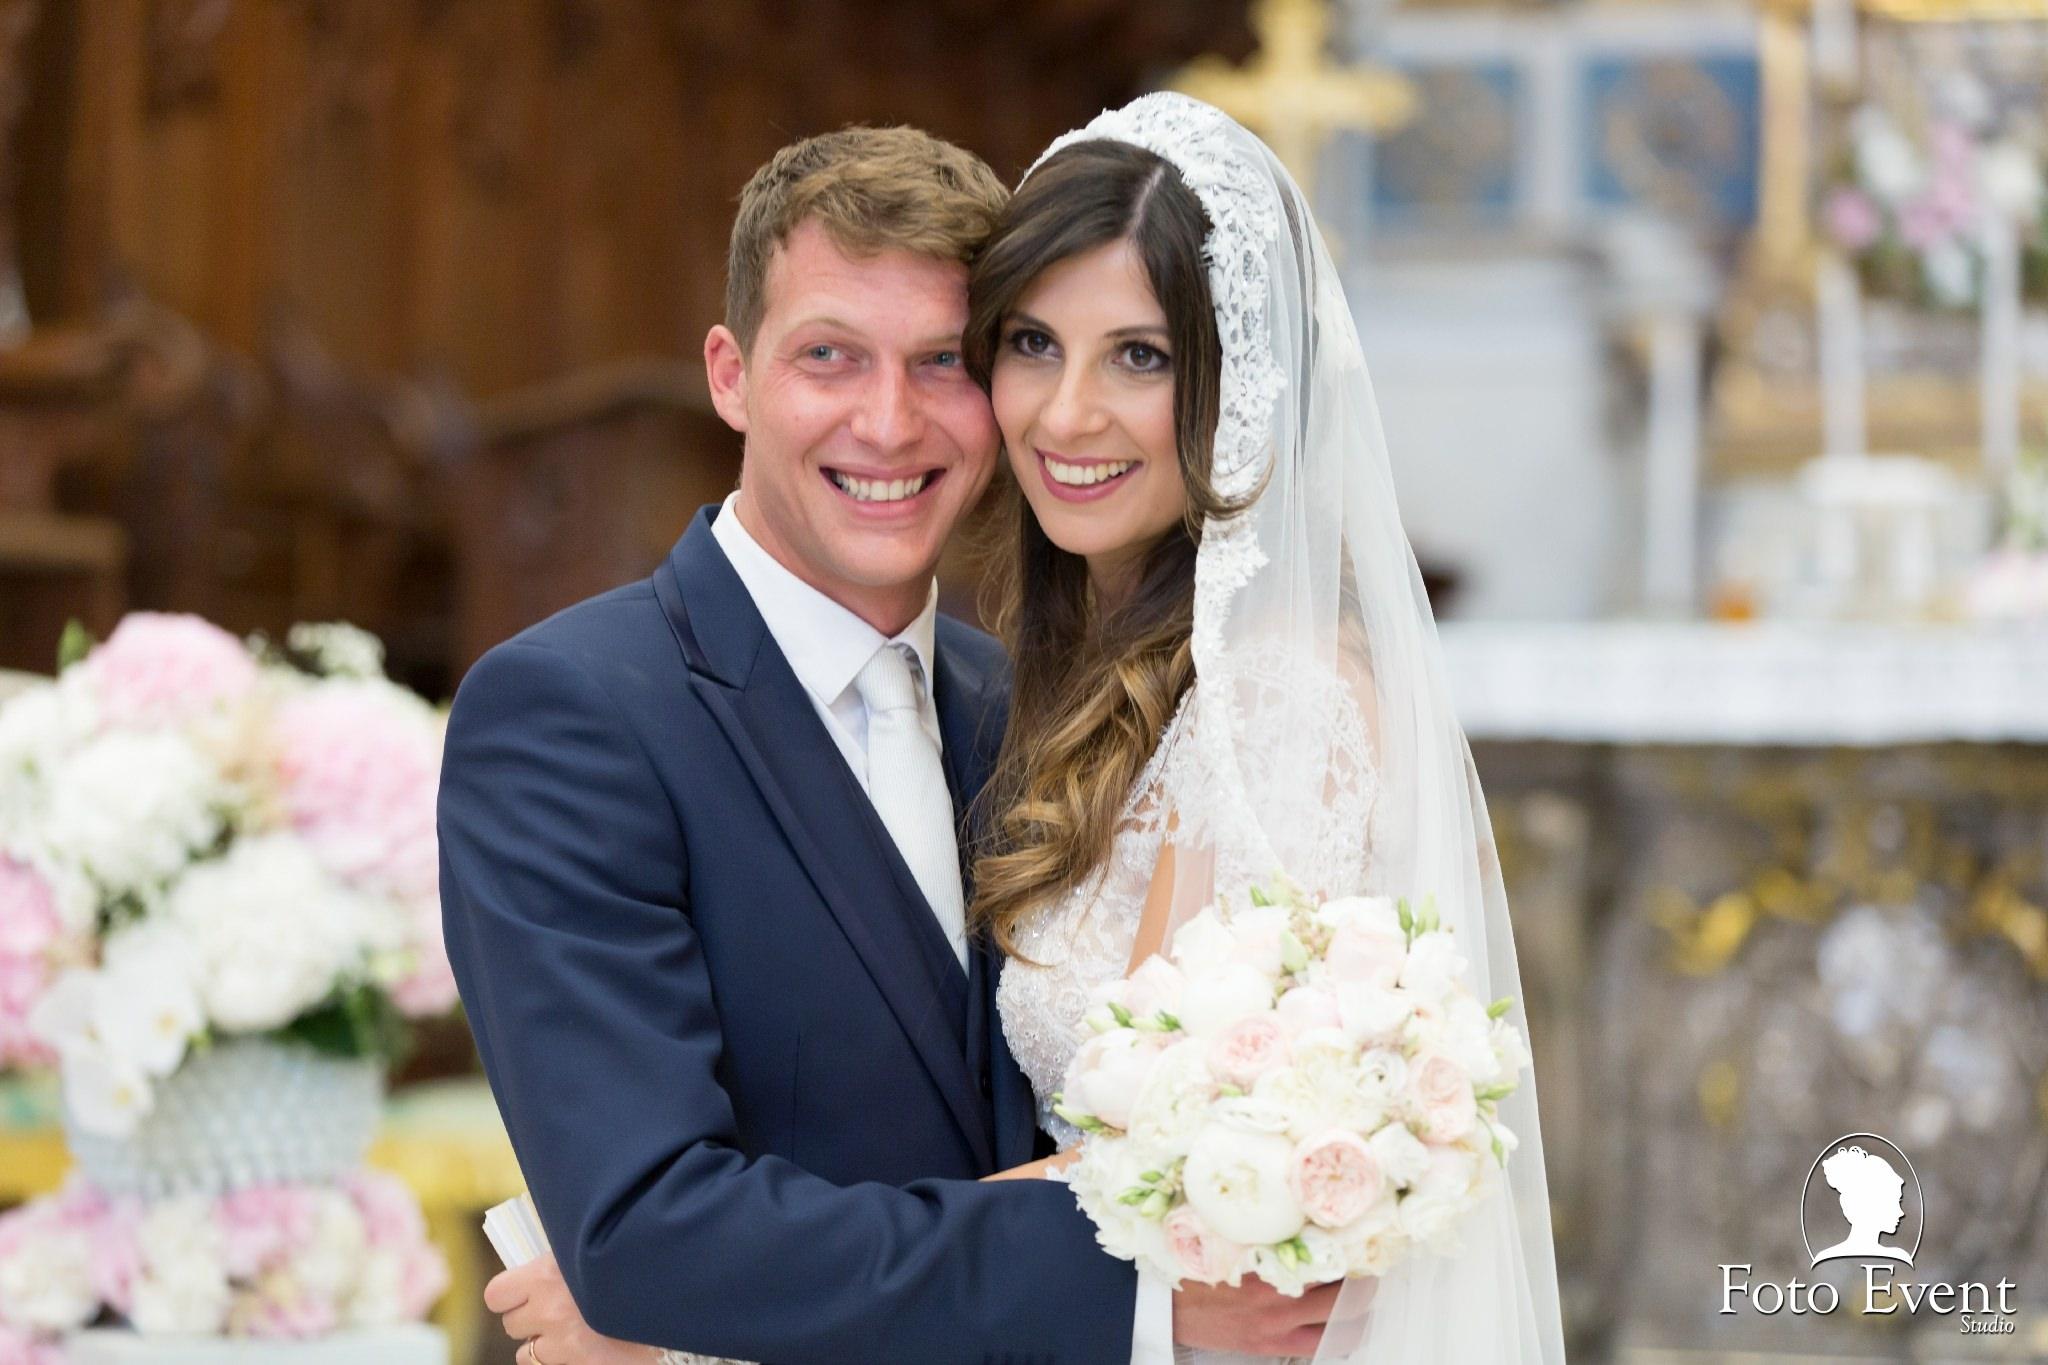 2017-07-21 Matrimonio Adriana e Giuseppe Dorsi zoom 221 CD FOTO